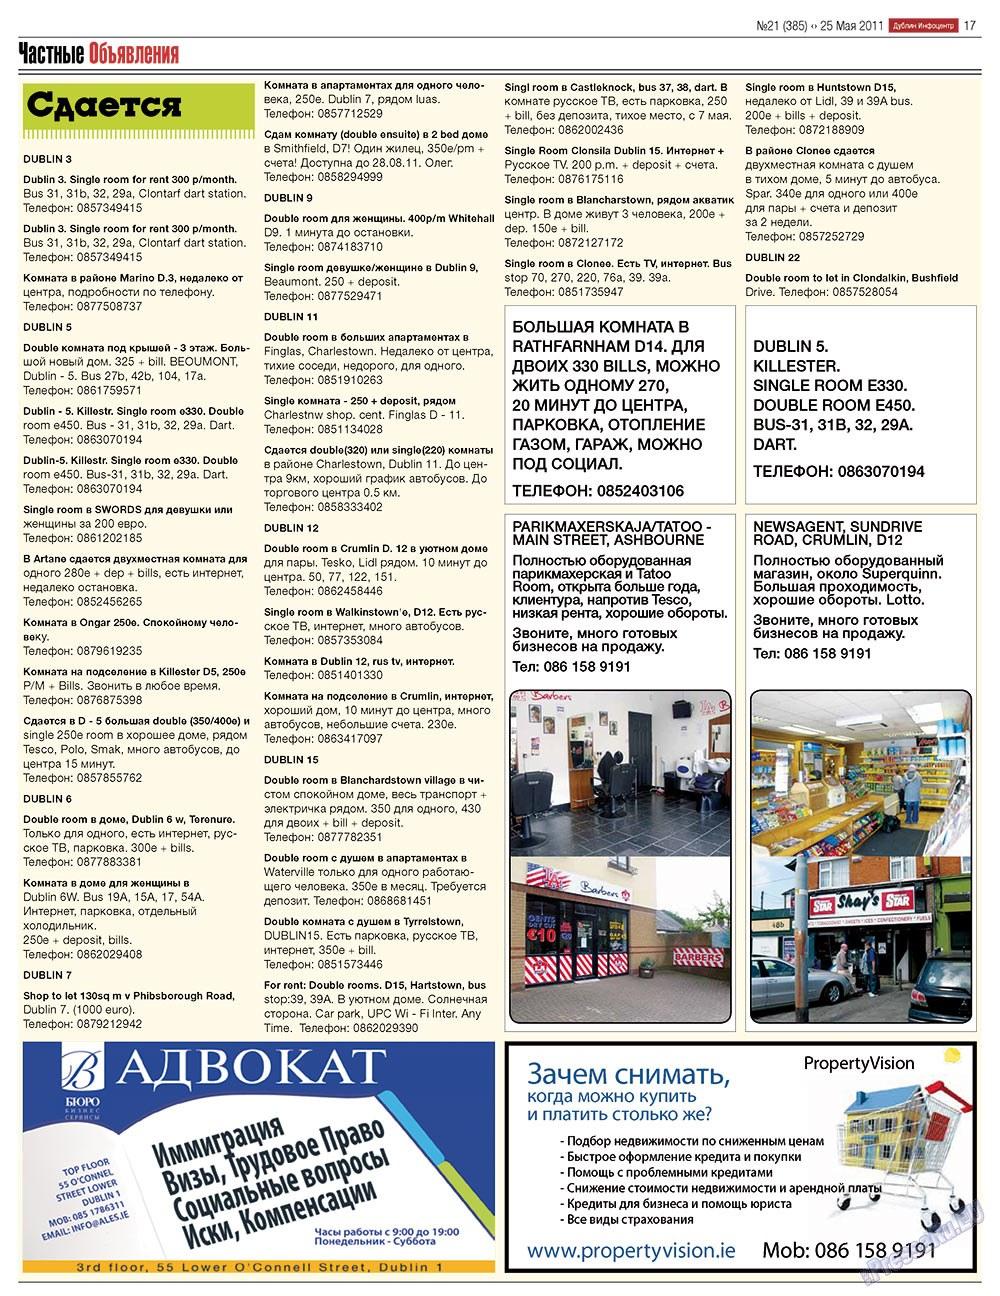 Дублин инфоцентр (газета). 2011 год, номер 21, стр. 17